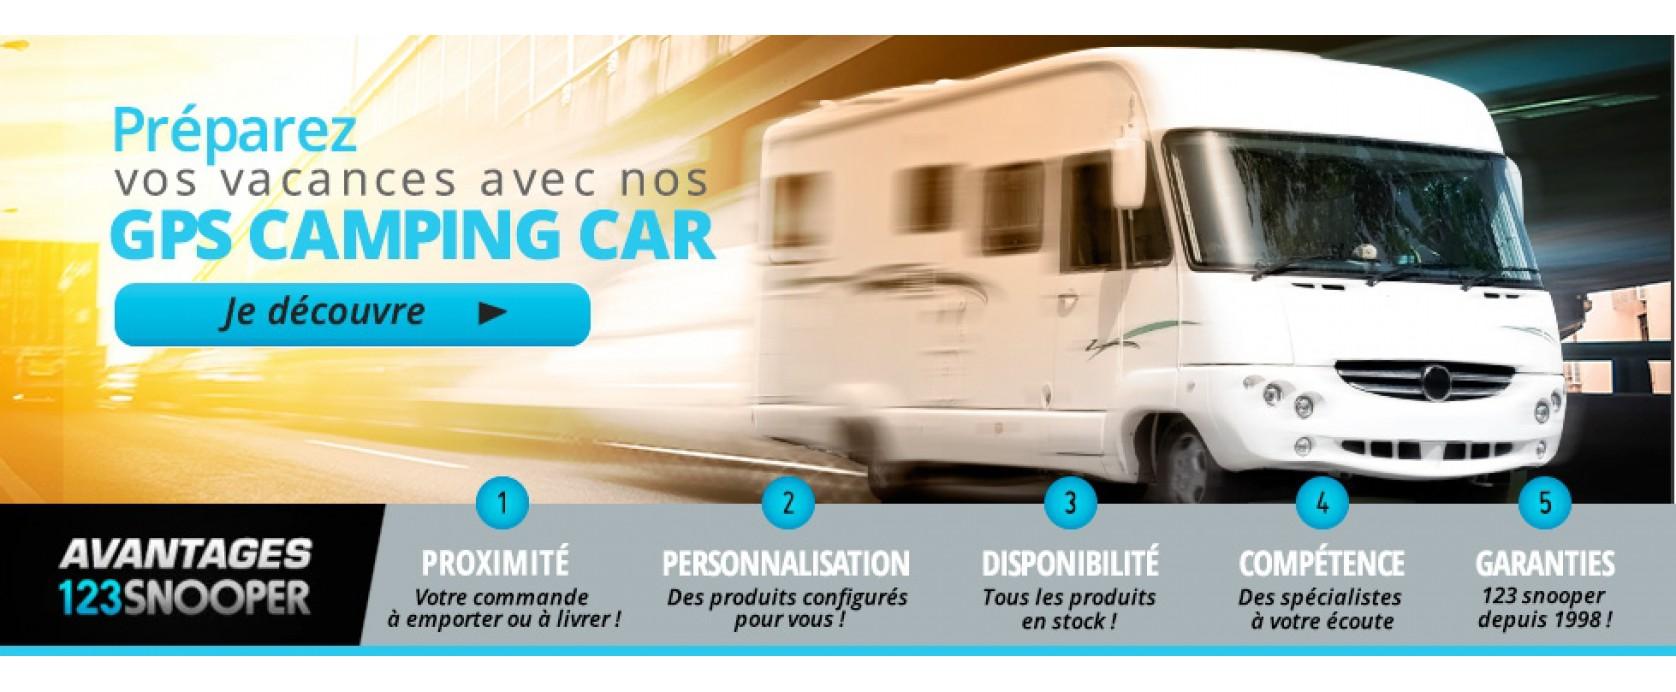 Gps camping-car - Boutique snooper